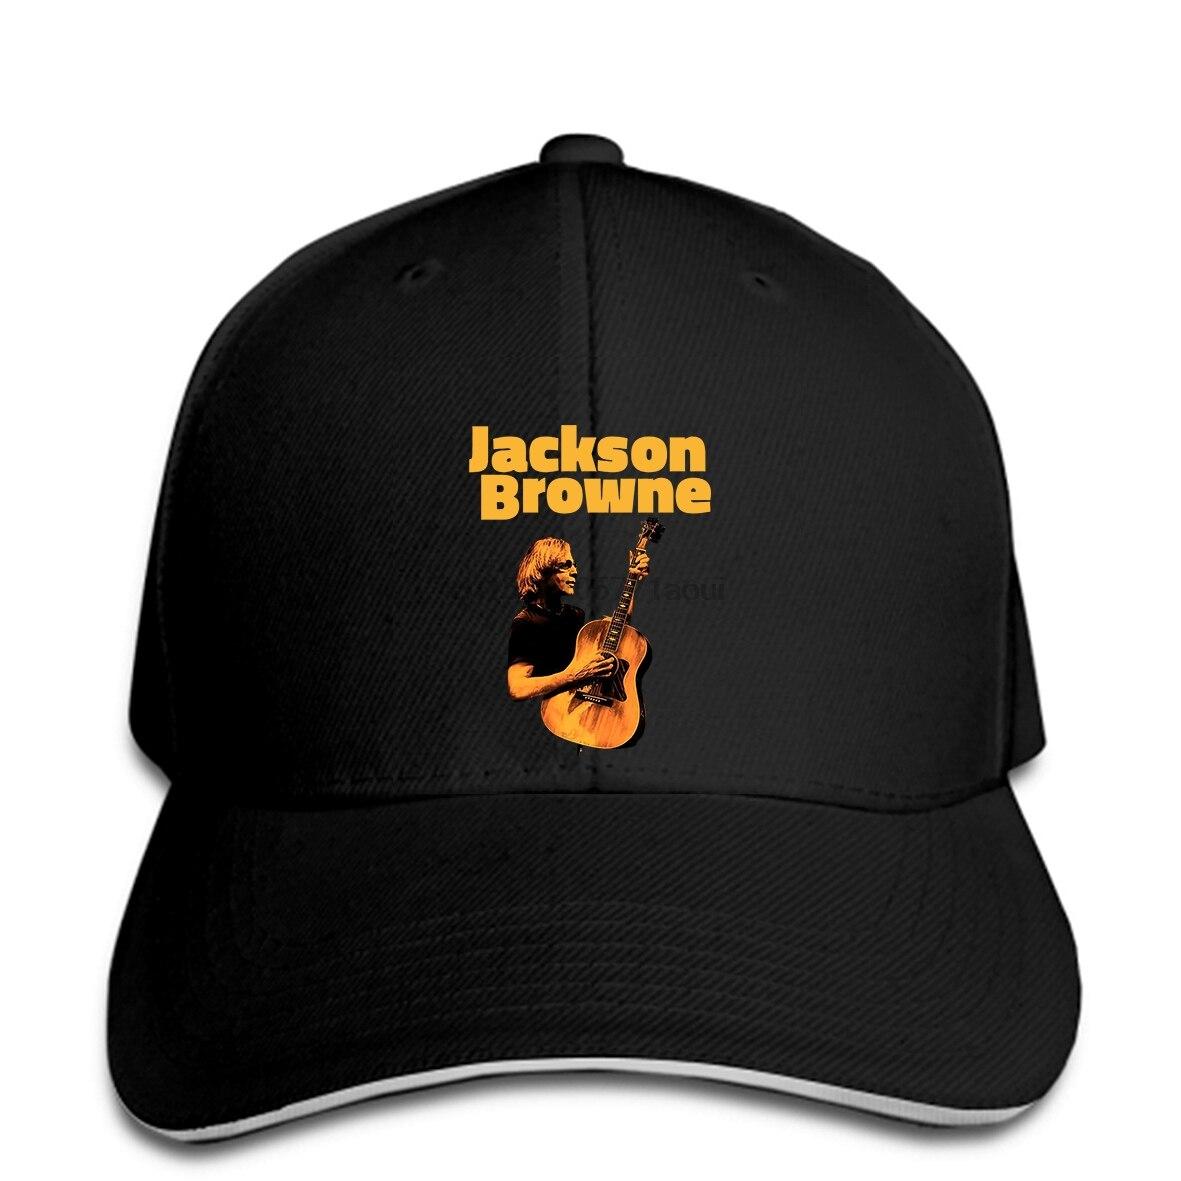 Gorra de béisbol nueva Popular Jackson Browne Tour concierto negro gorras de béisbol s-x